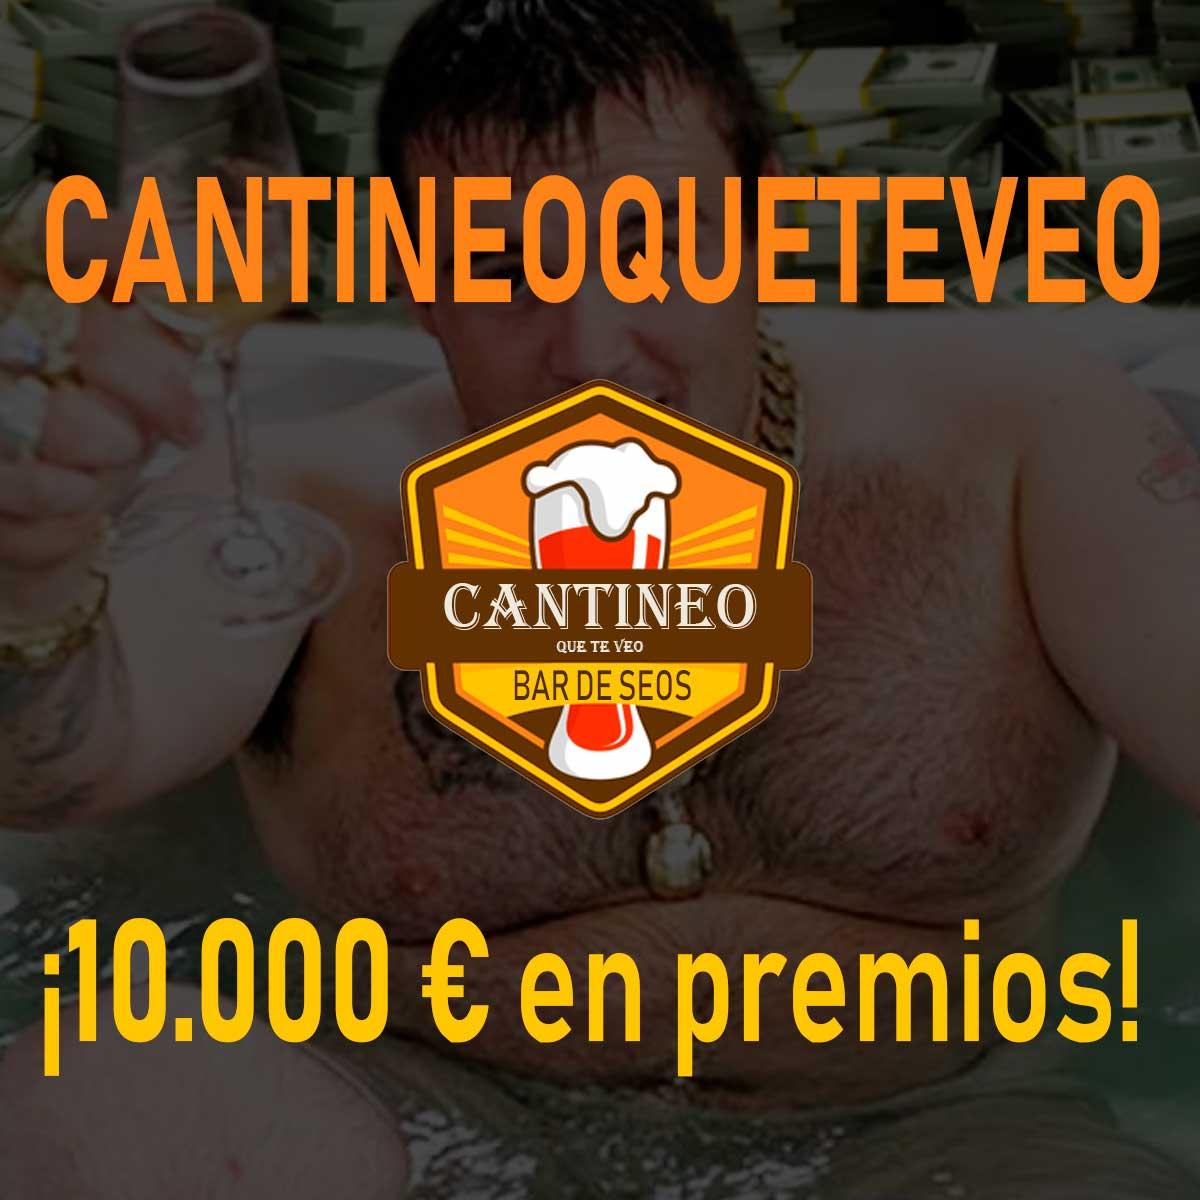 Premios Cantineoqueteveo - Concurso SEO